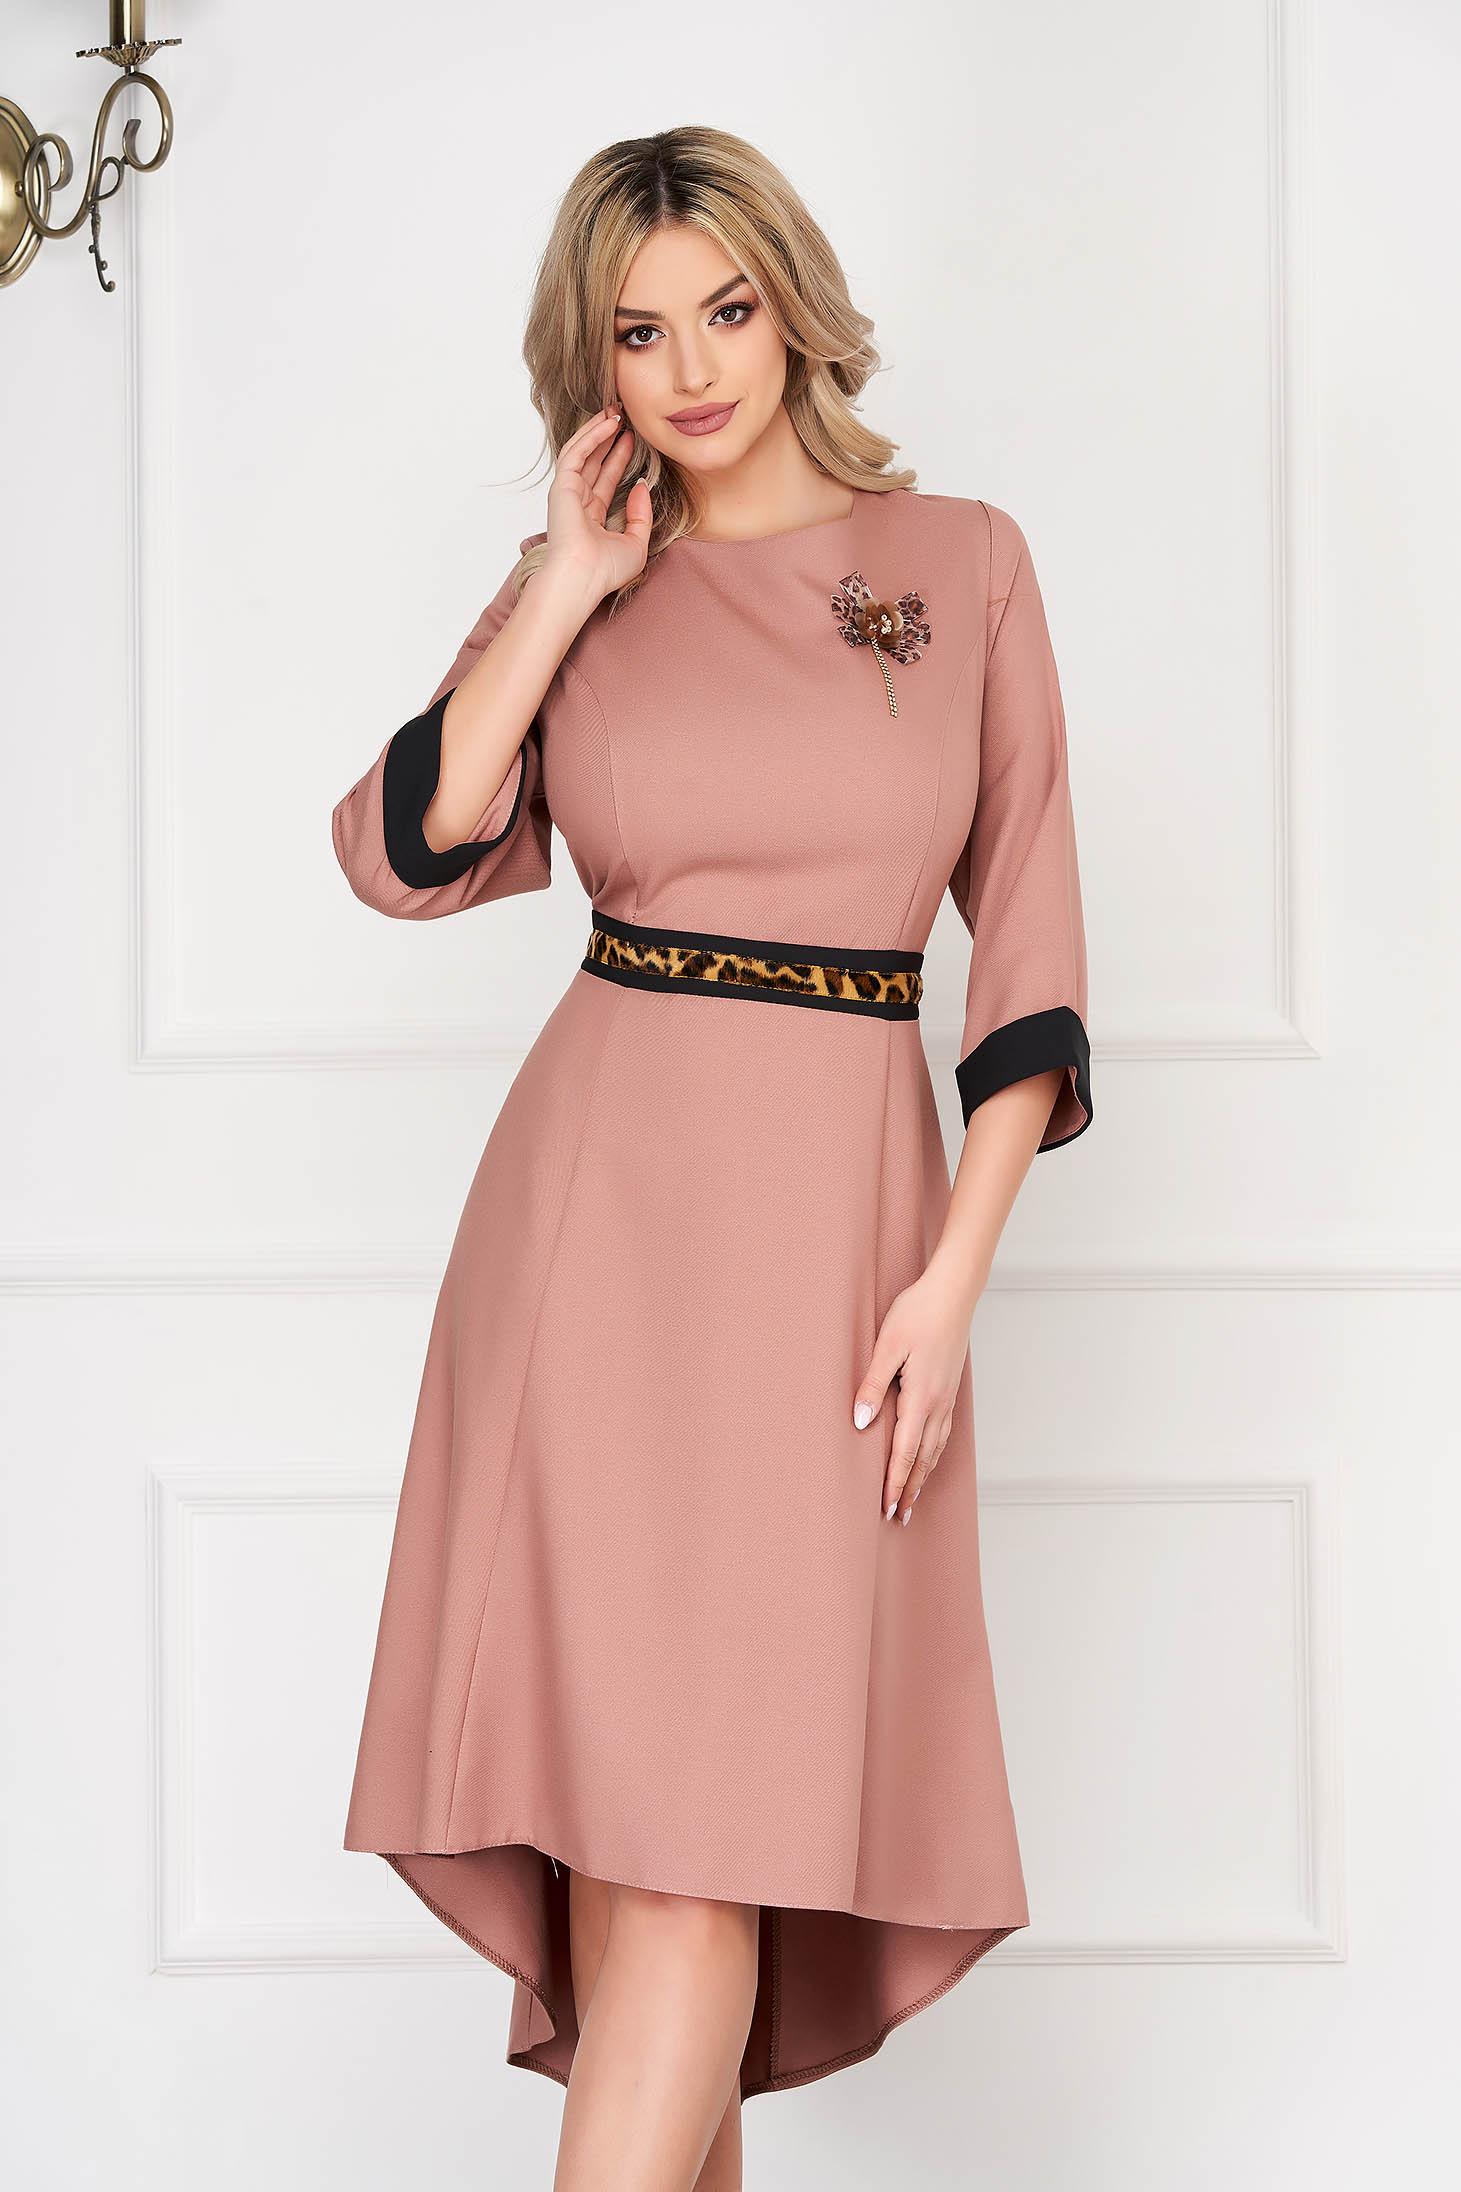 Lightpink dress elegant midi asymmetrical cloche cloth thin fabric accessorized with breastpin